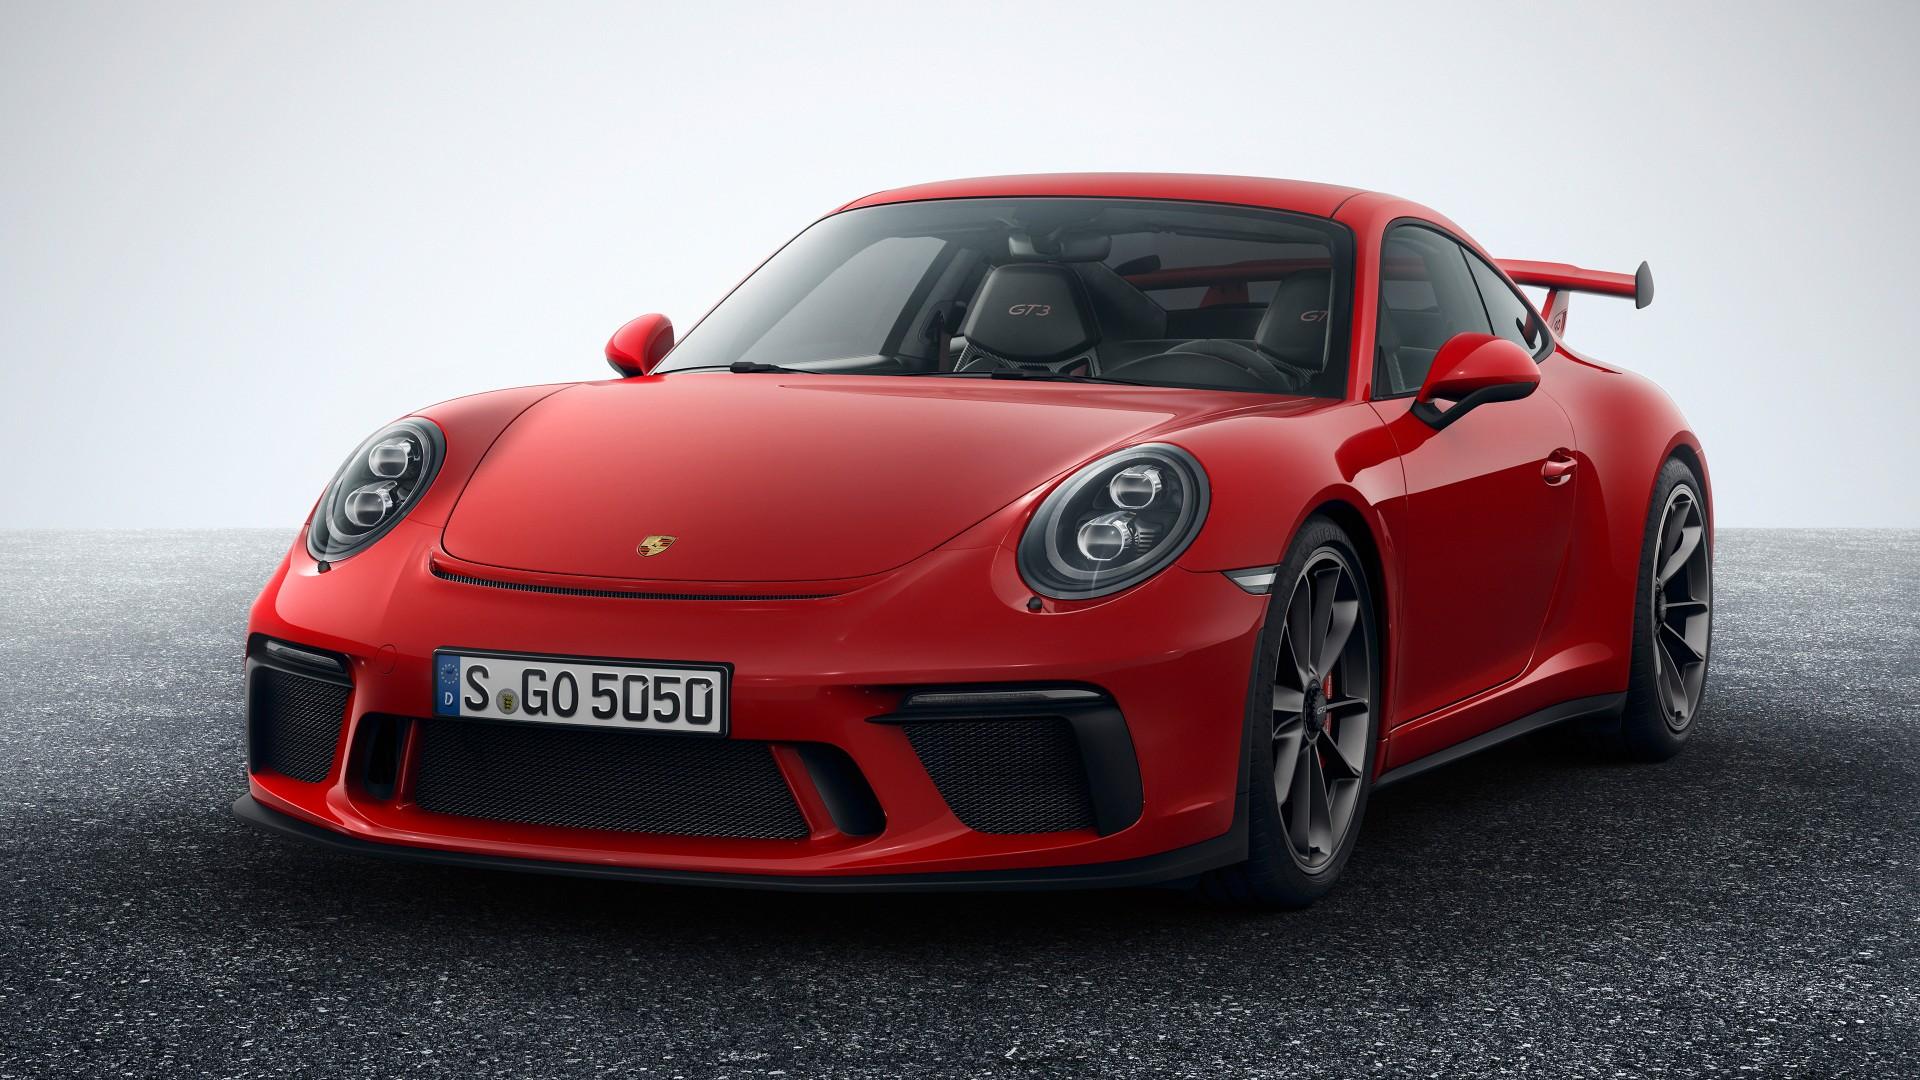 Porsche 911 Gt3 2017 Wallpapers  Hd Wallpapers  Id #19952